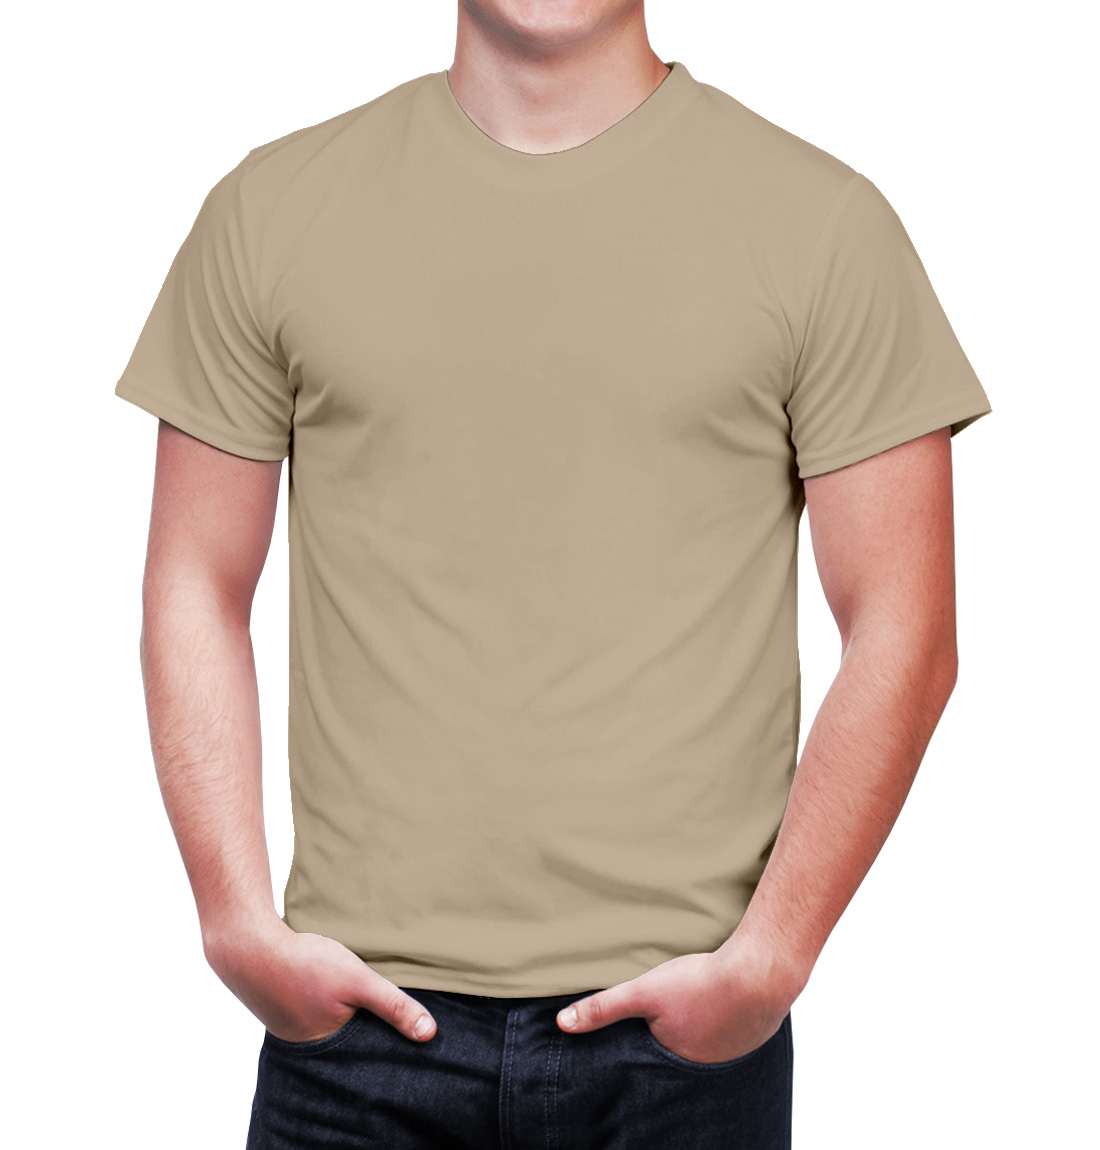 Clothing t shirts enharid crew neck t shirt sky beige enharid for Custom dress shirts orange county